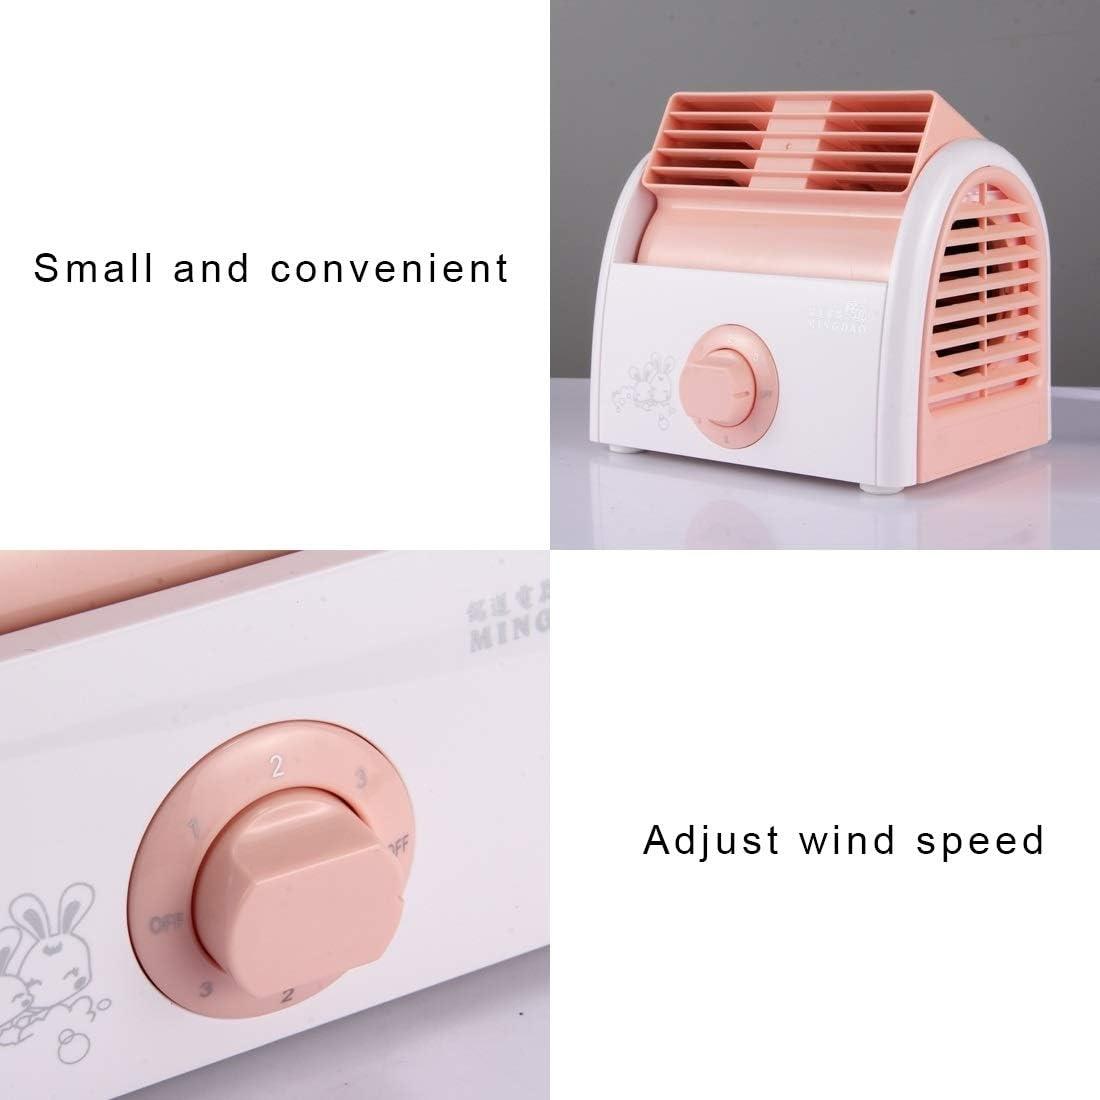 JSANSUI elektrische ventilator 30W Turbine geen Blade Mini Desktop Mute Ventilator voor slaapzaal/slaapkamer/woonkamer/kantoor, 3 soorten Speed Mode, AC 220V, Groen roze 9mtNpWvc